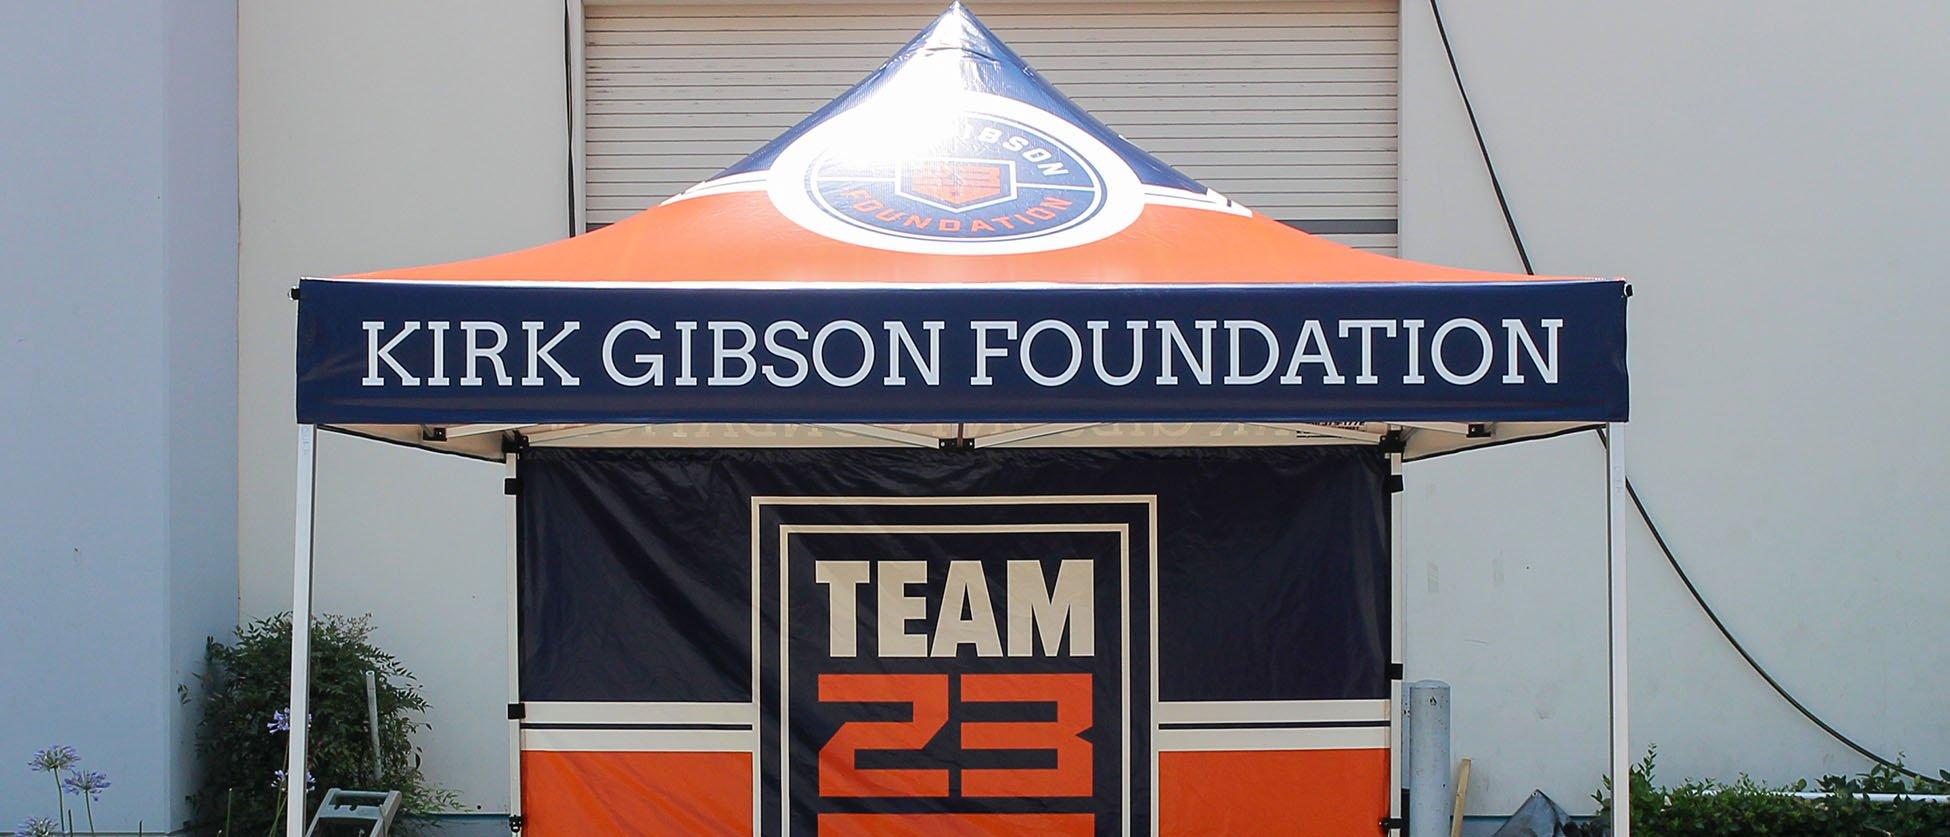 kirk-gibson-foundation-header.jpg